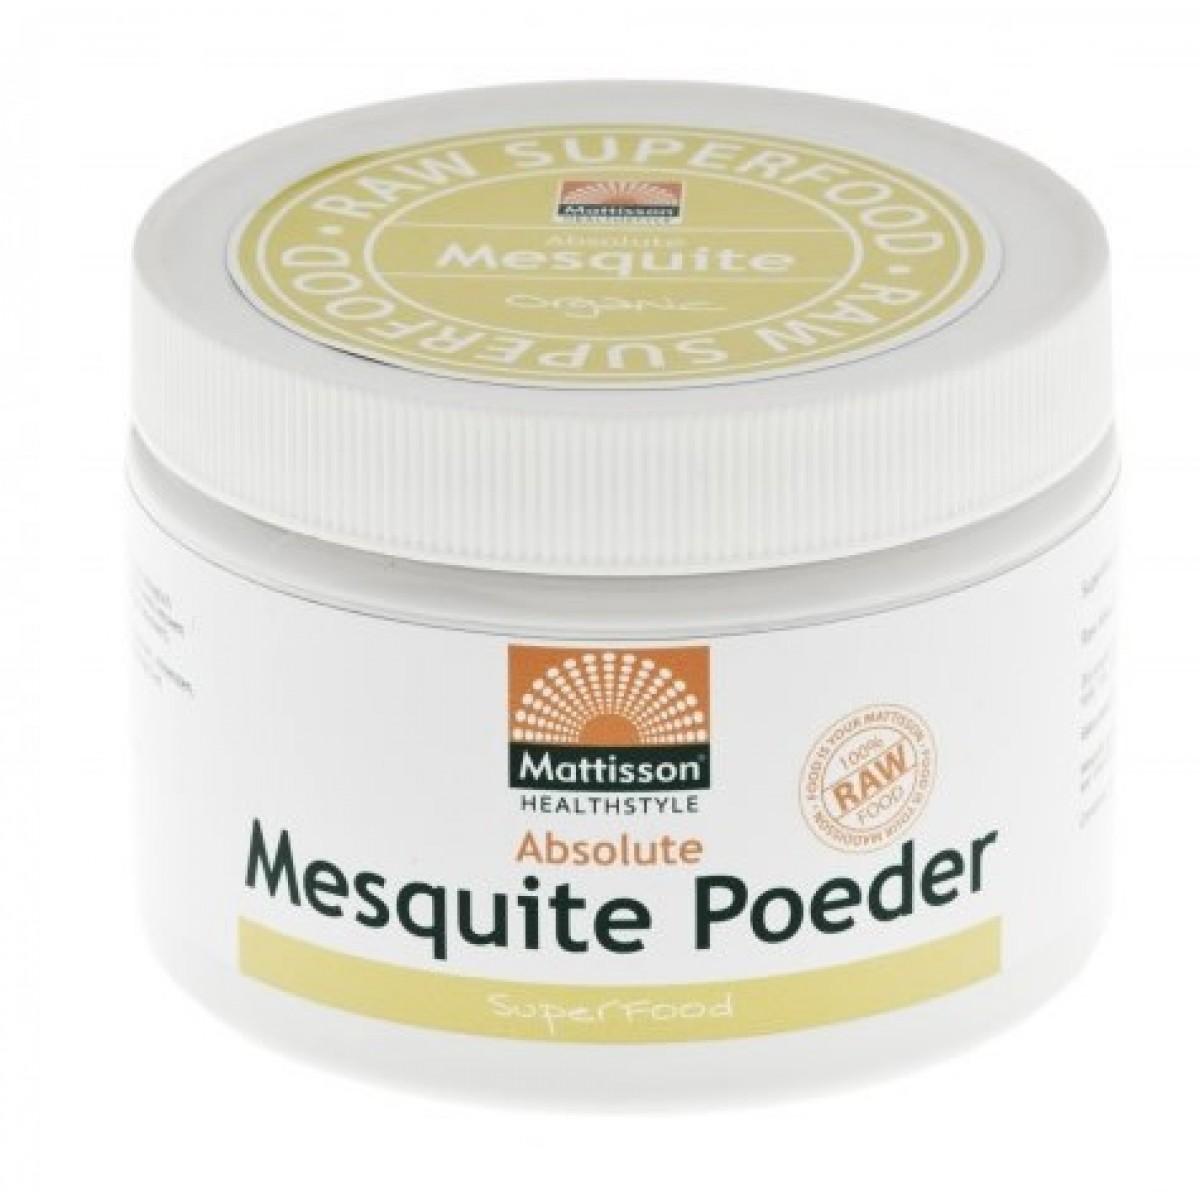 Mesquite Poeder